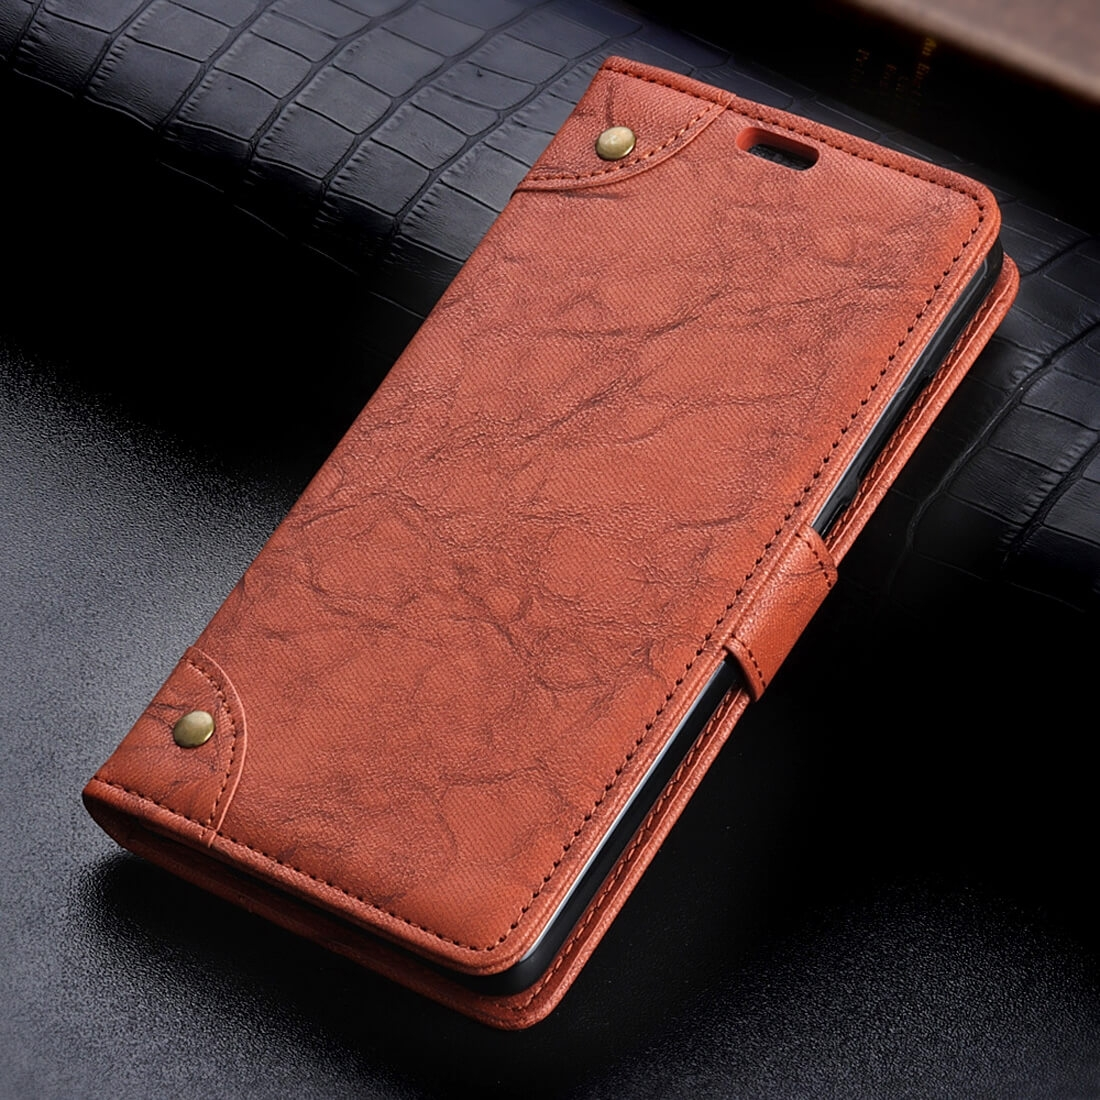 FORCELL PRESTIGE Peňaženkový obal Motorola Moto E5 hnedý